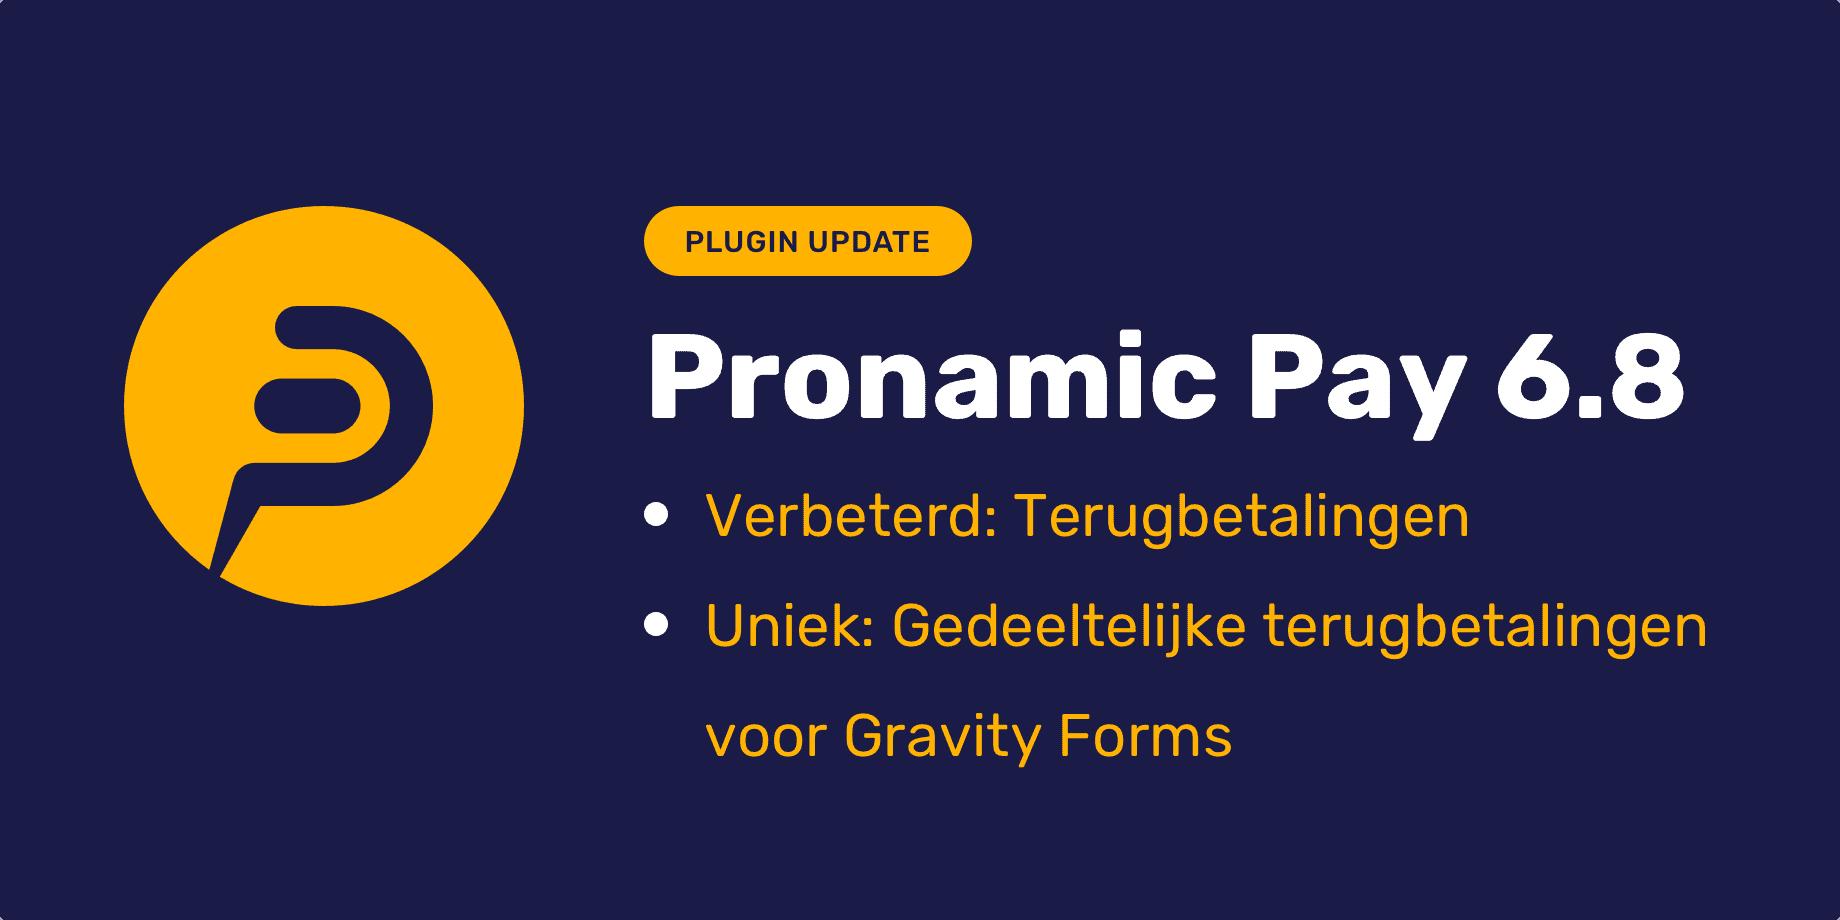 Pronamic Pay 6.8